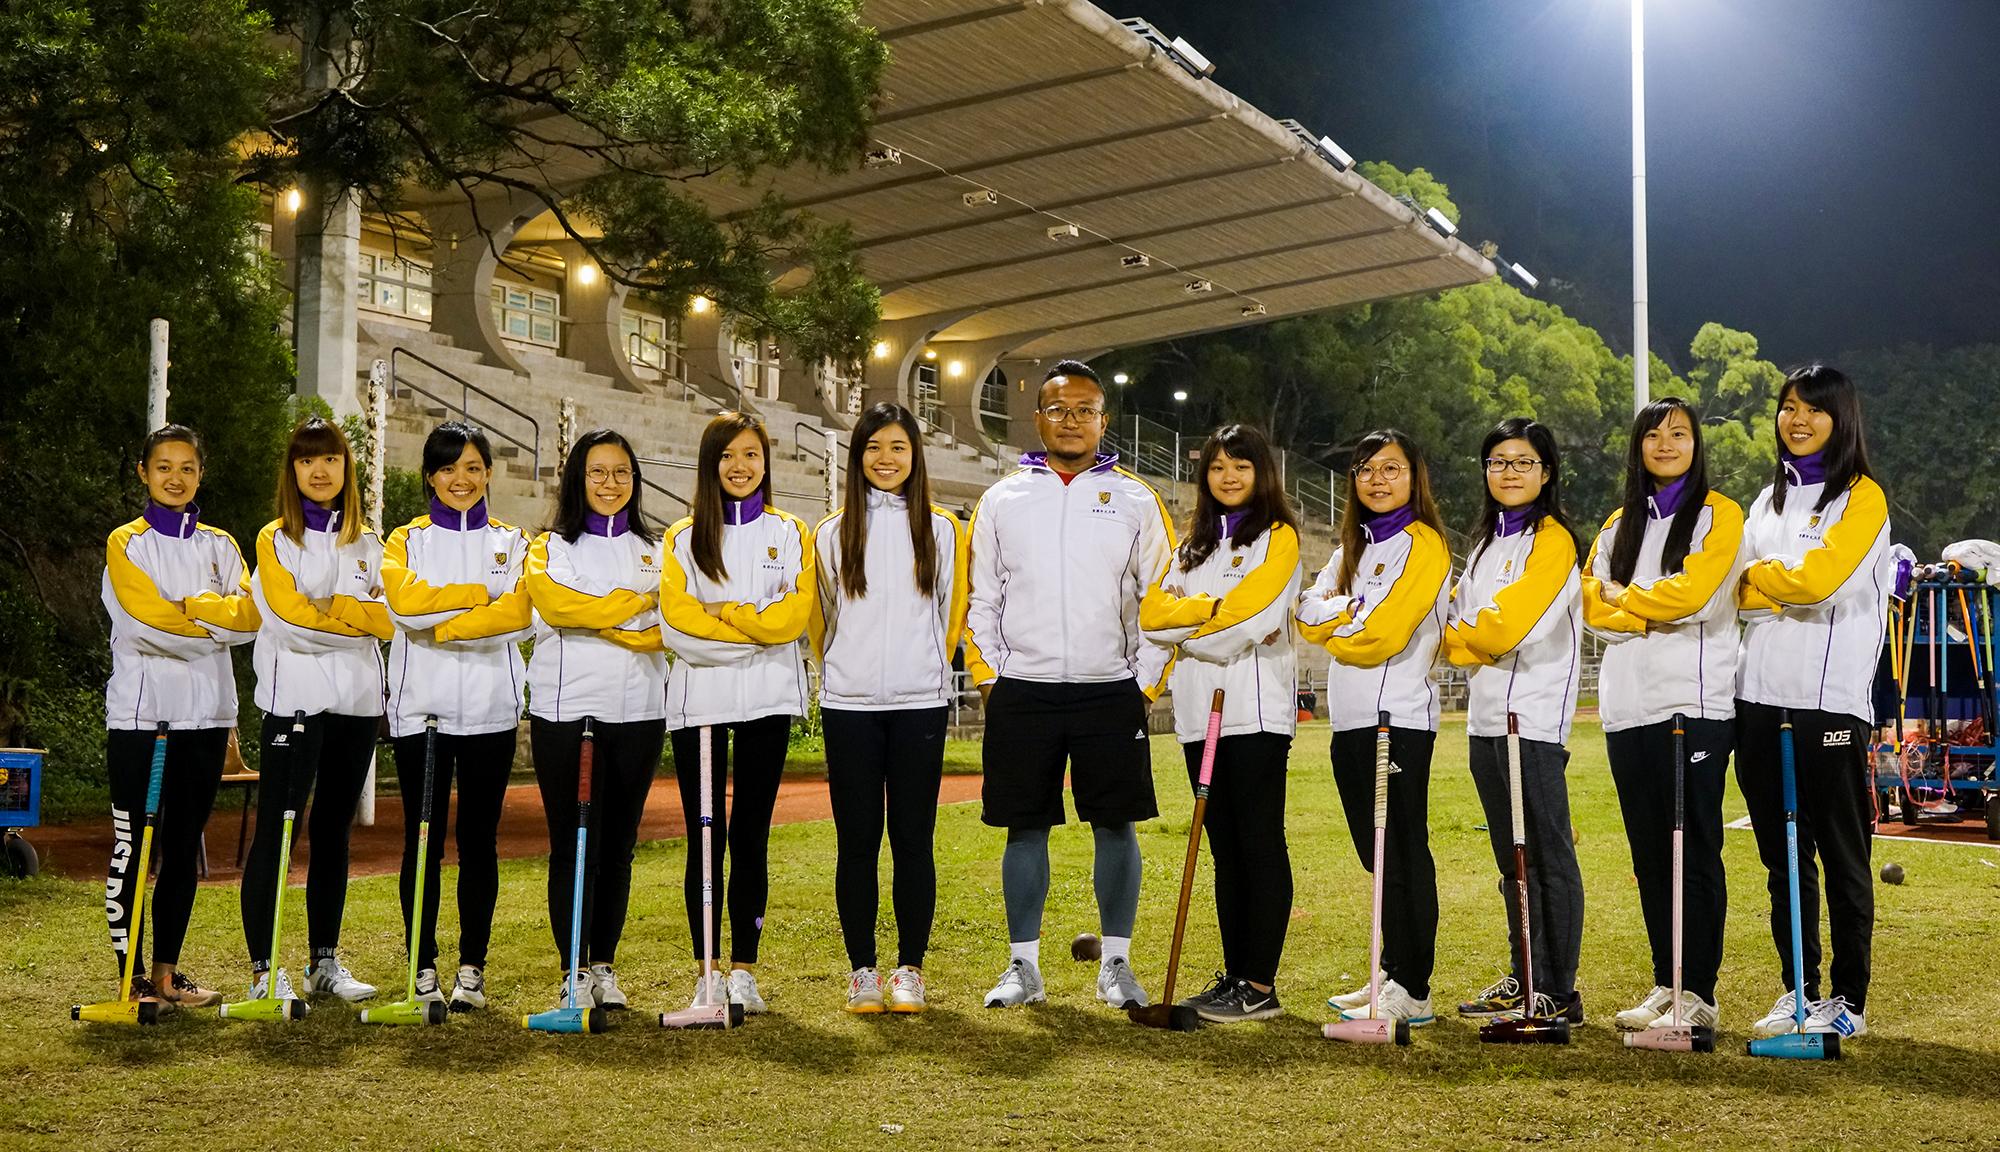 Woodball girls 2018 2019